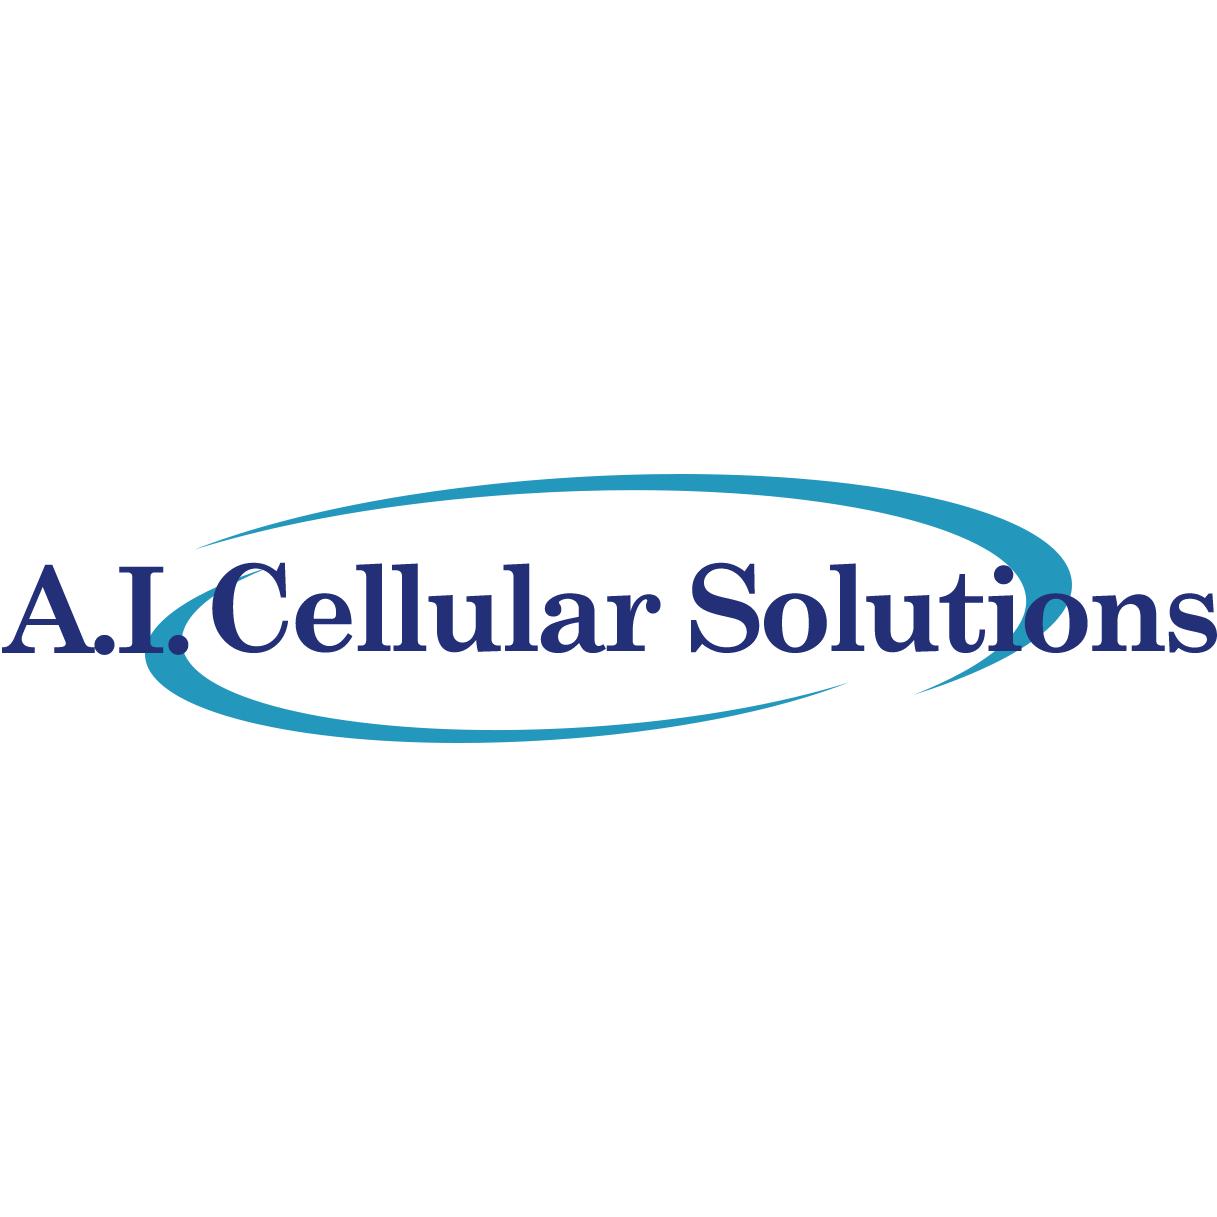 A.I. Cellular Solutions Logo